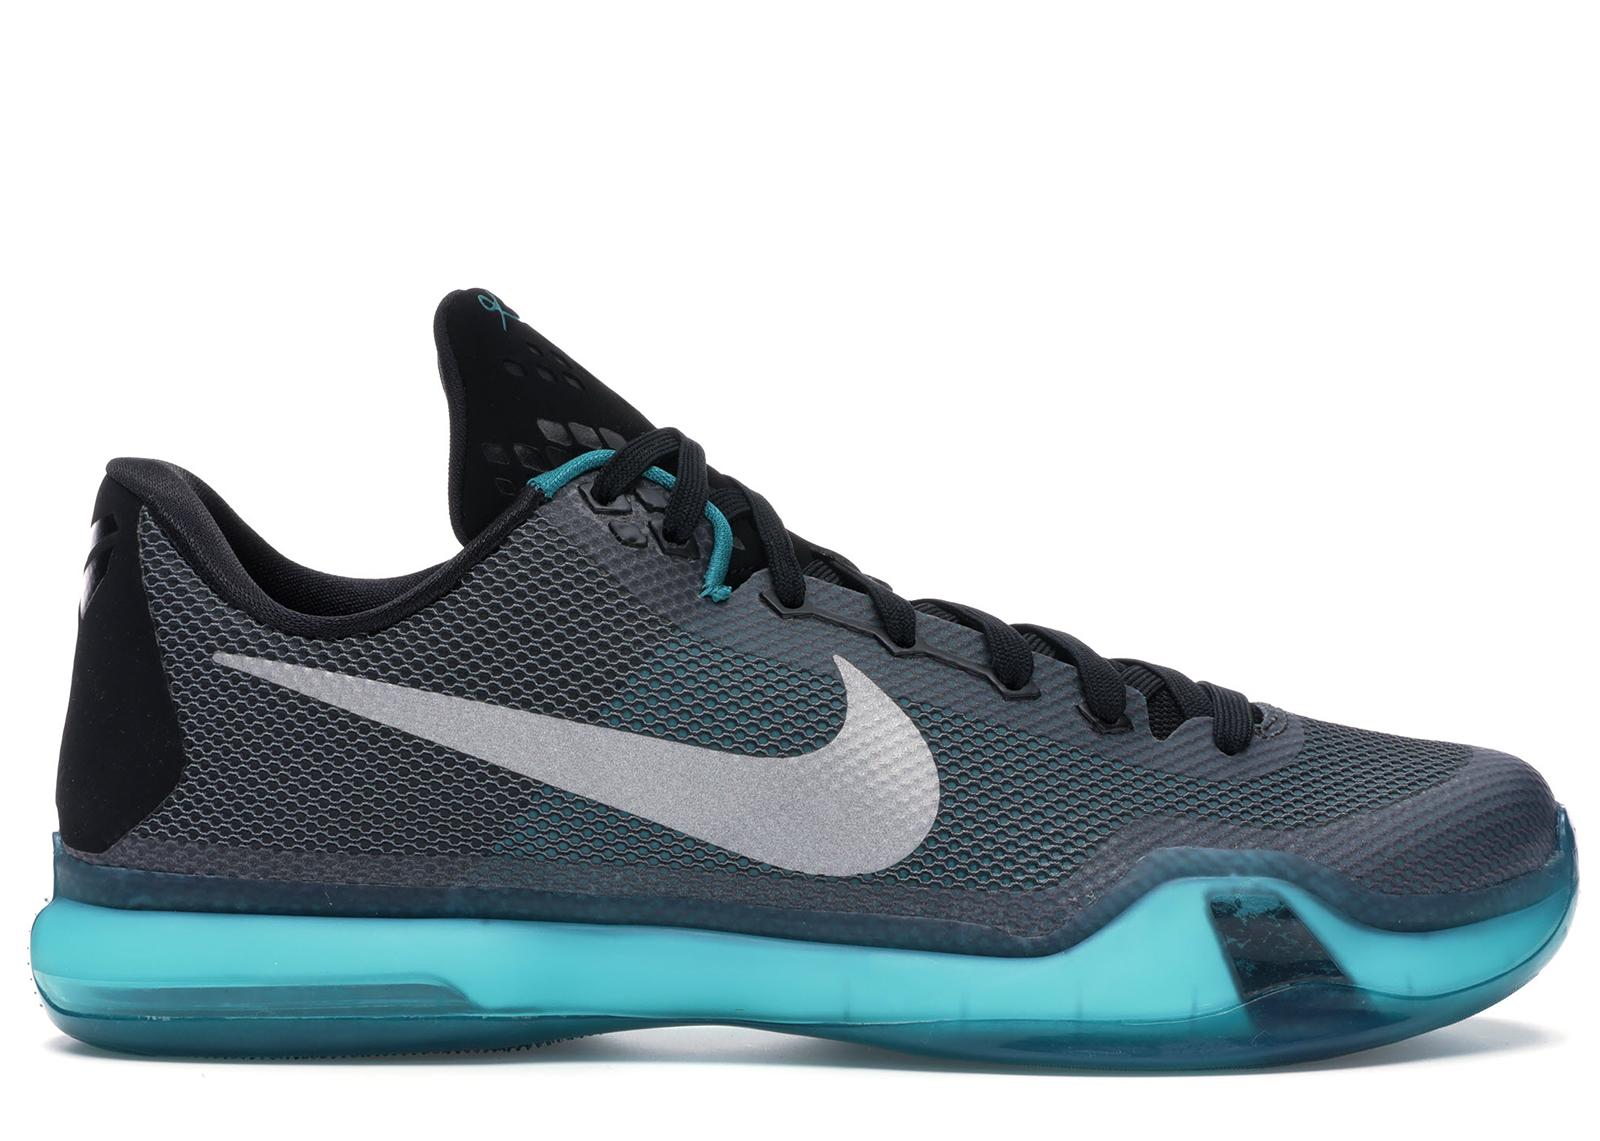 Nike Kobe 10 Radiant Emerald - 705317-002